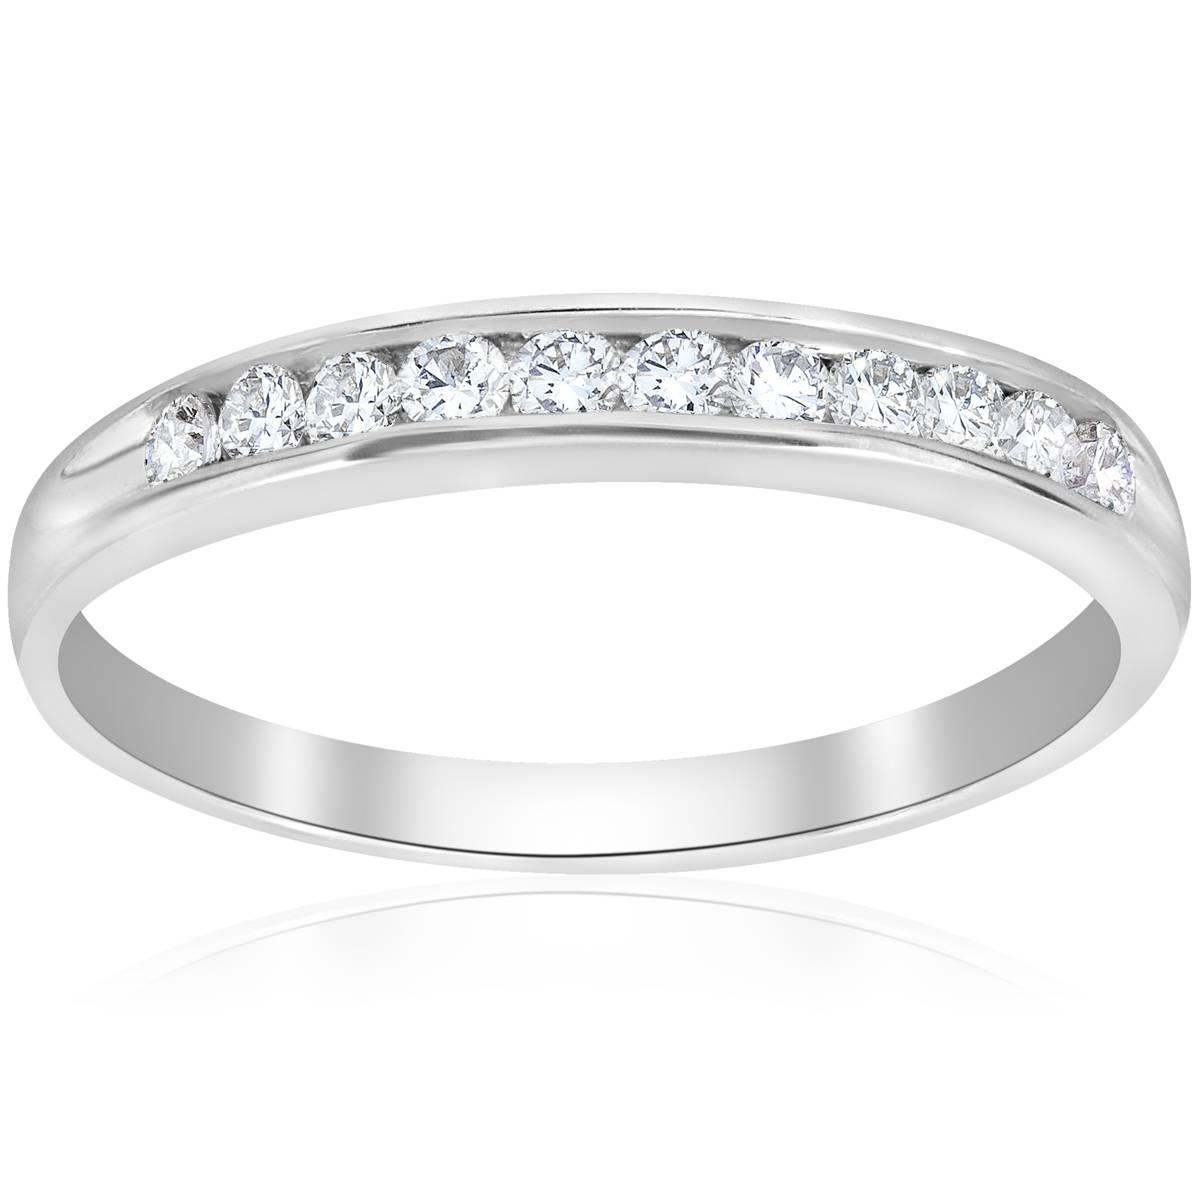 1 4ct diamond 14k white gold wedding stackable ring womens channel set band ebay. Black Bedroom Furniture Sets. Home Design Ideas